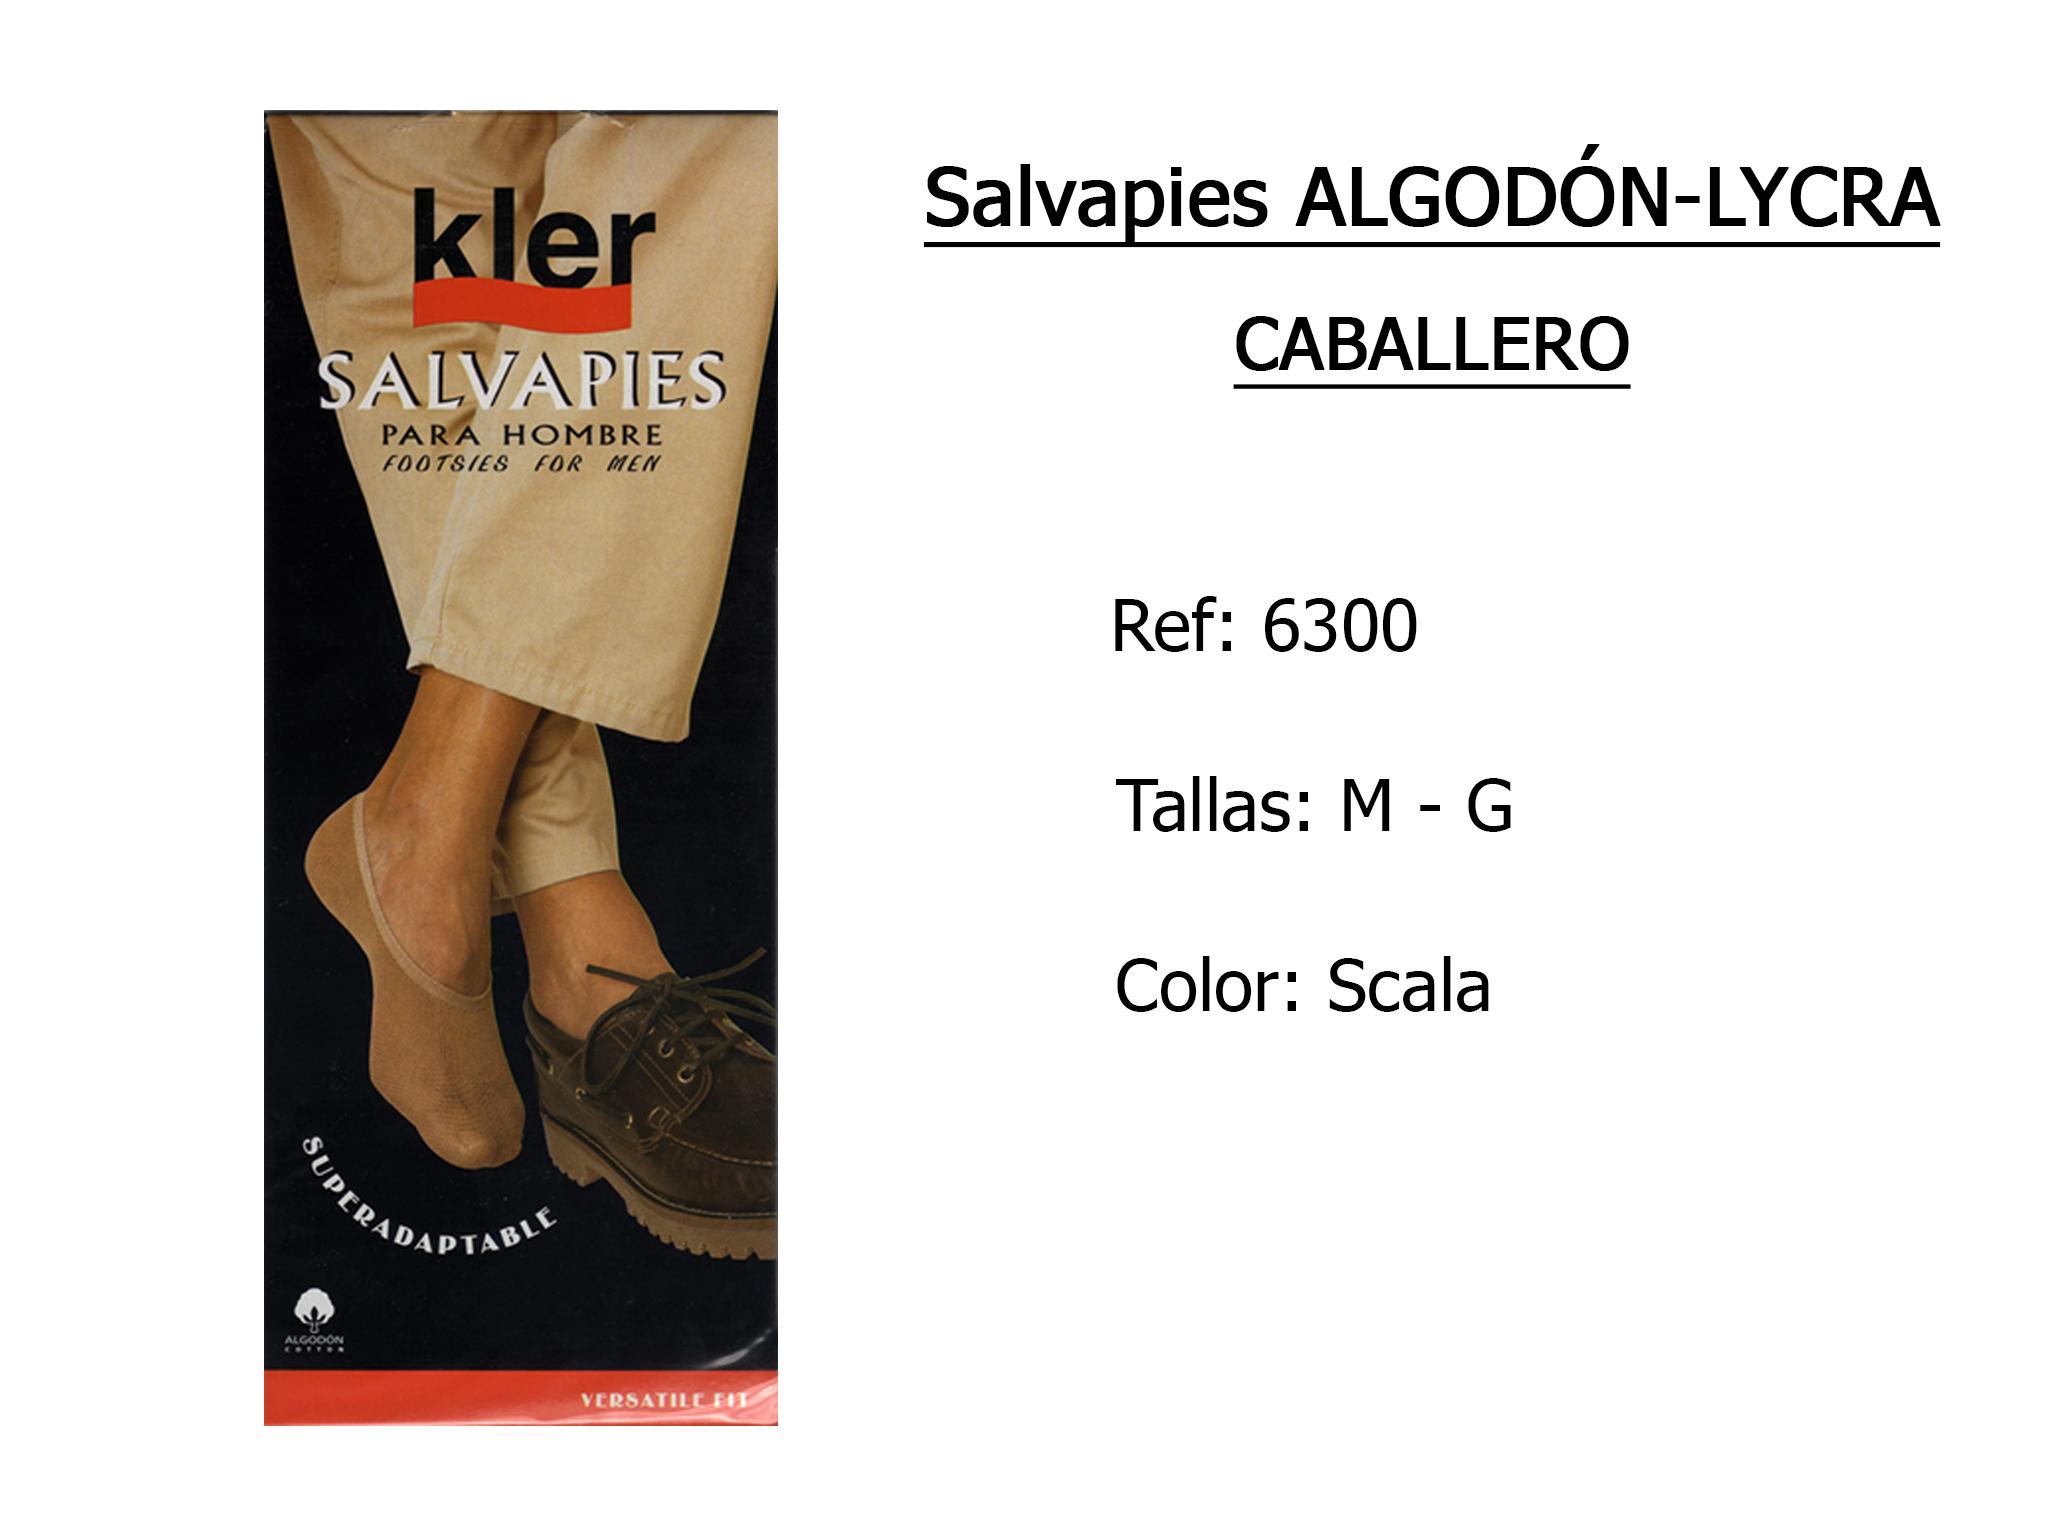 SALVAPIES algodon lycra caballero 6300